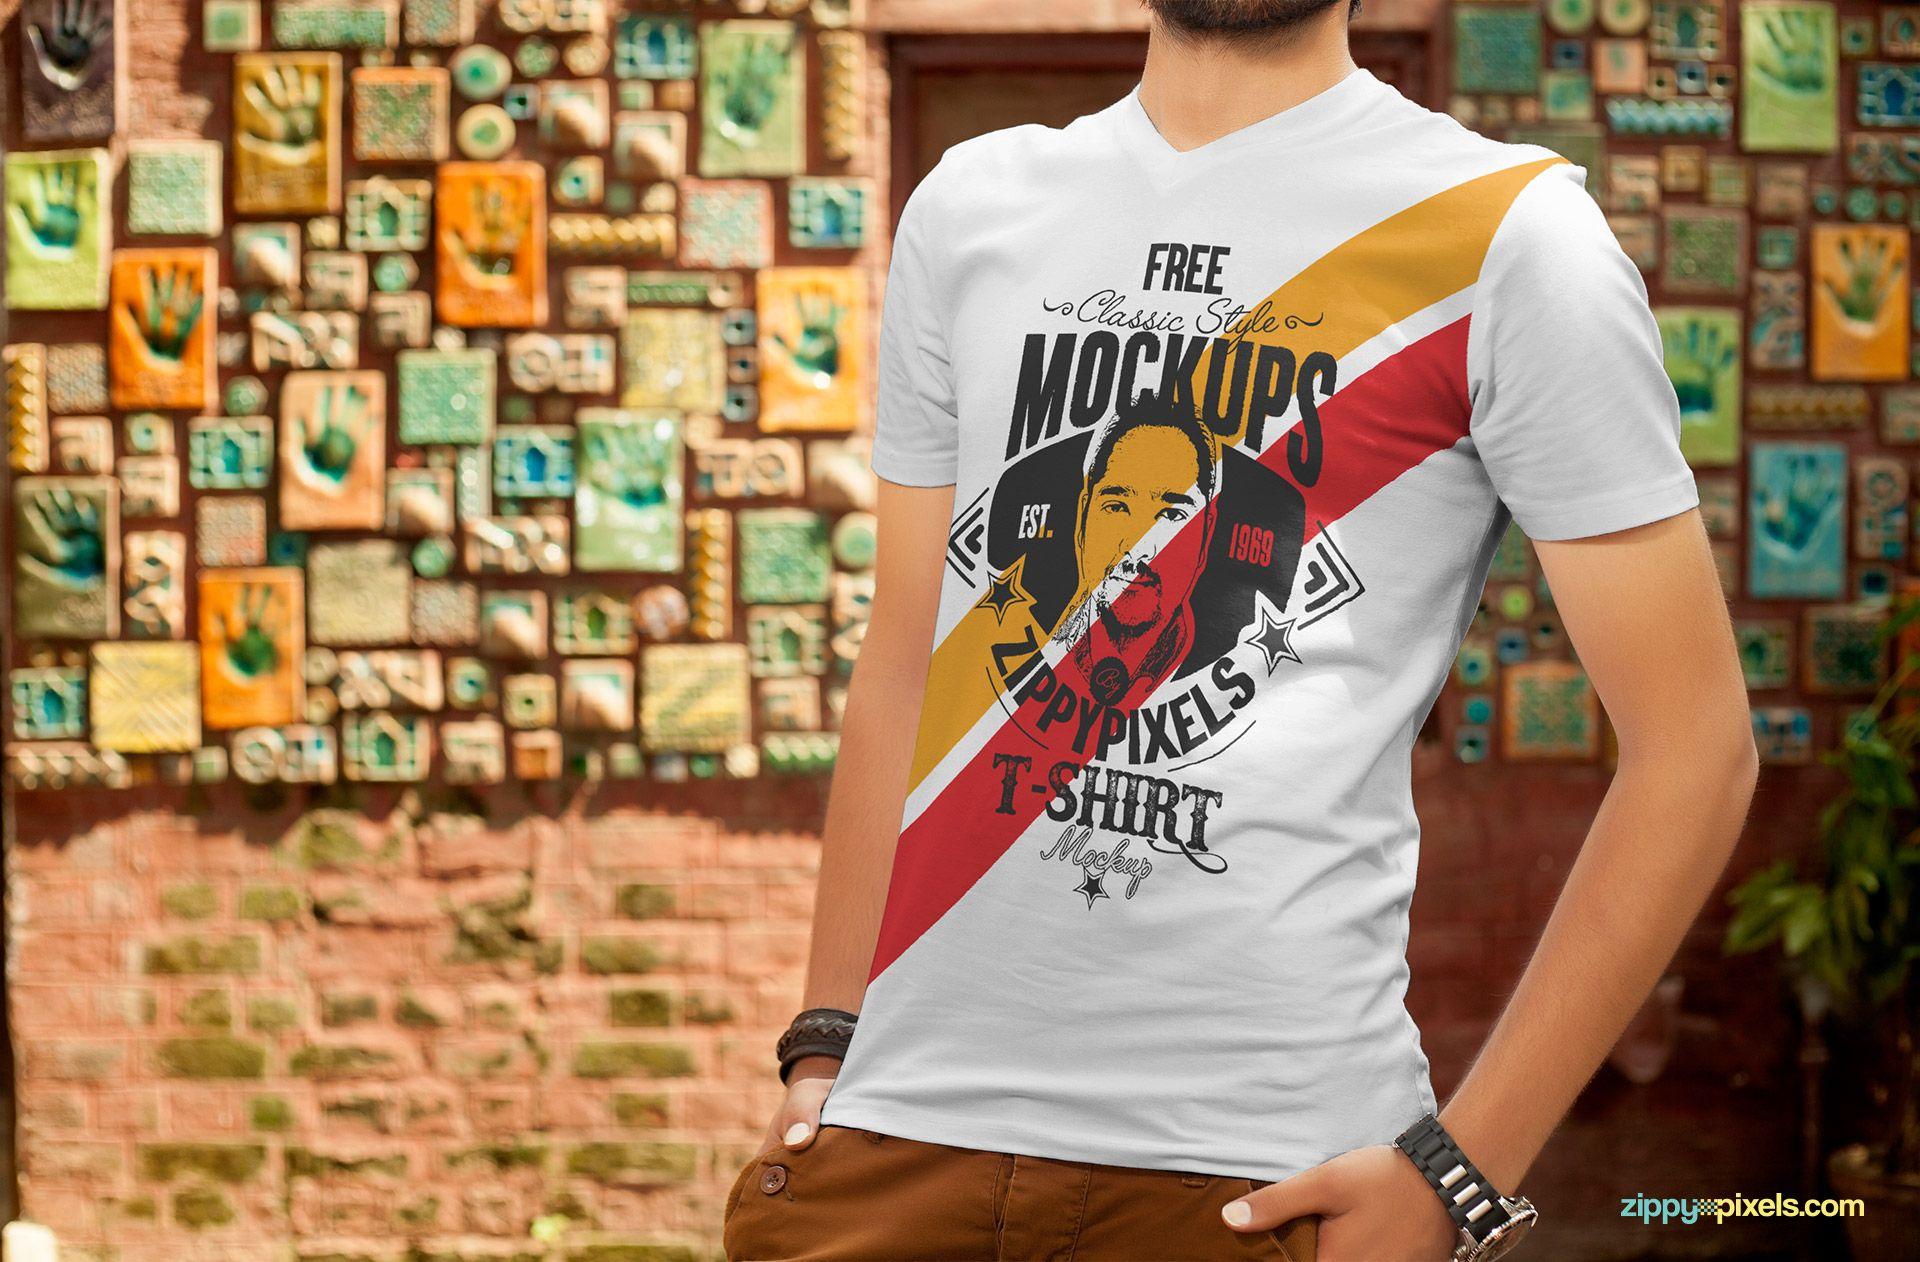 Download Free T Shirt Design Mockup Zippypixels Free T Shirt Design Shirt Mockup Clothing Mockup